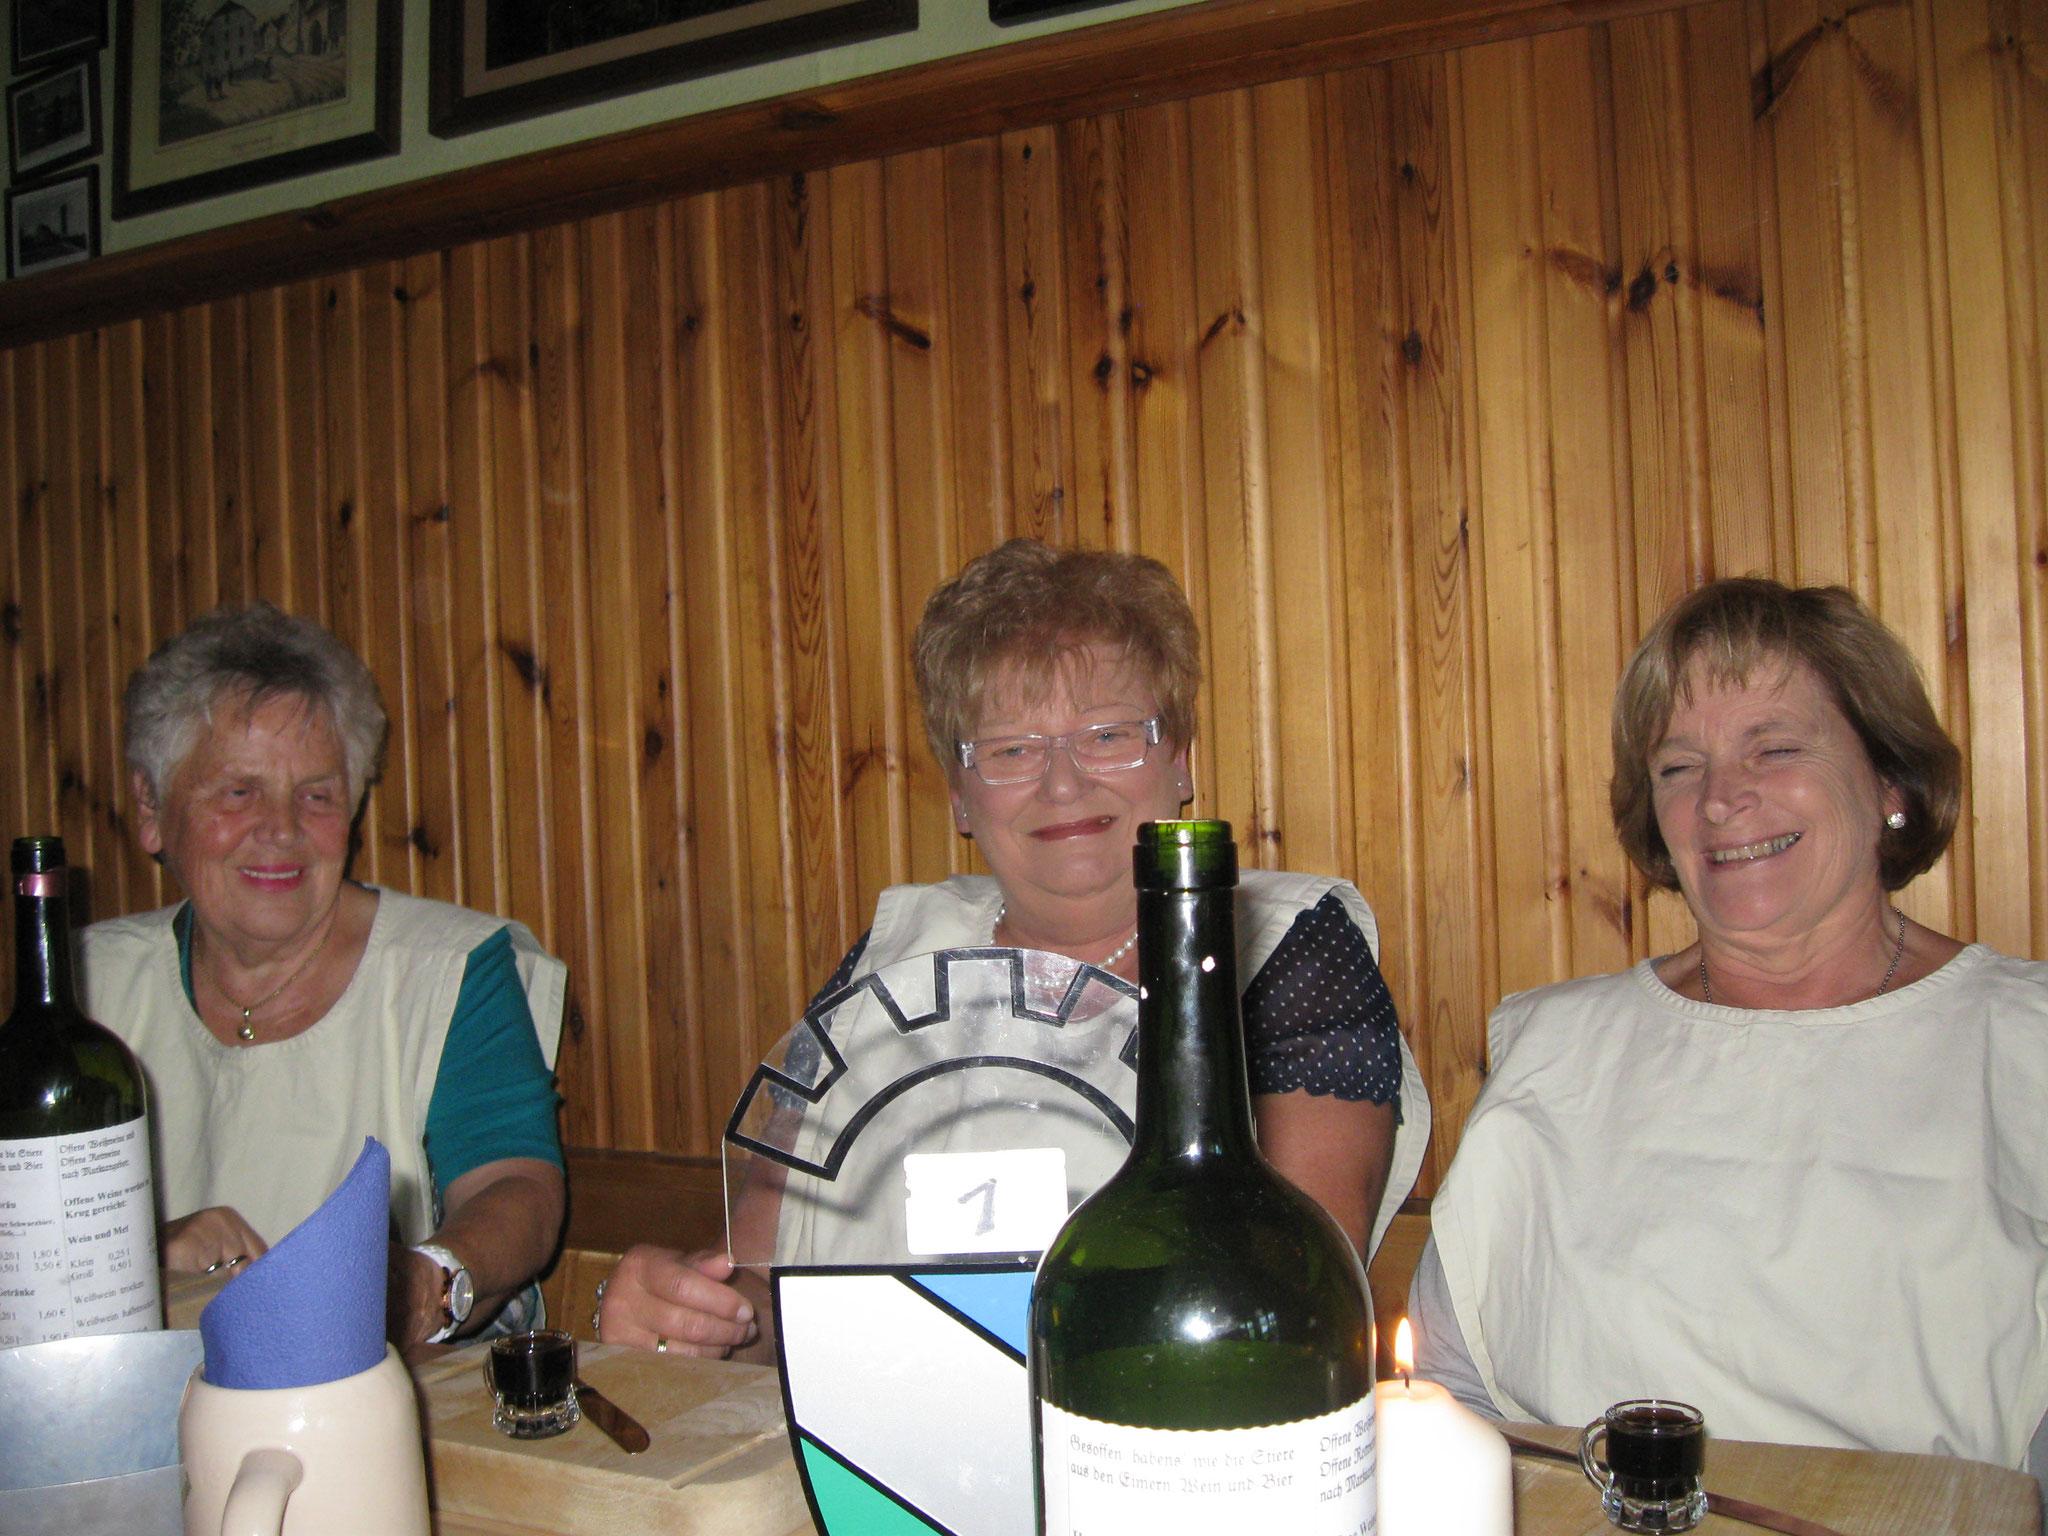 Drei Weibsen in Erwartung des Rittermahls